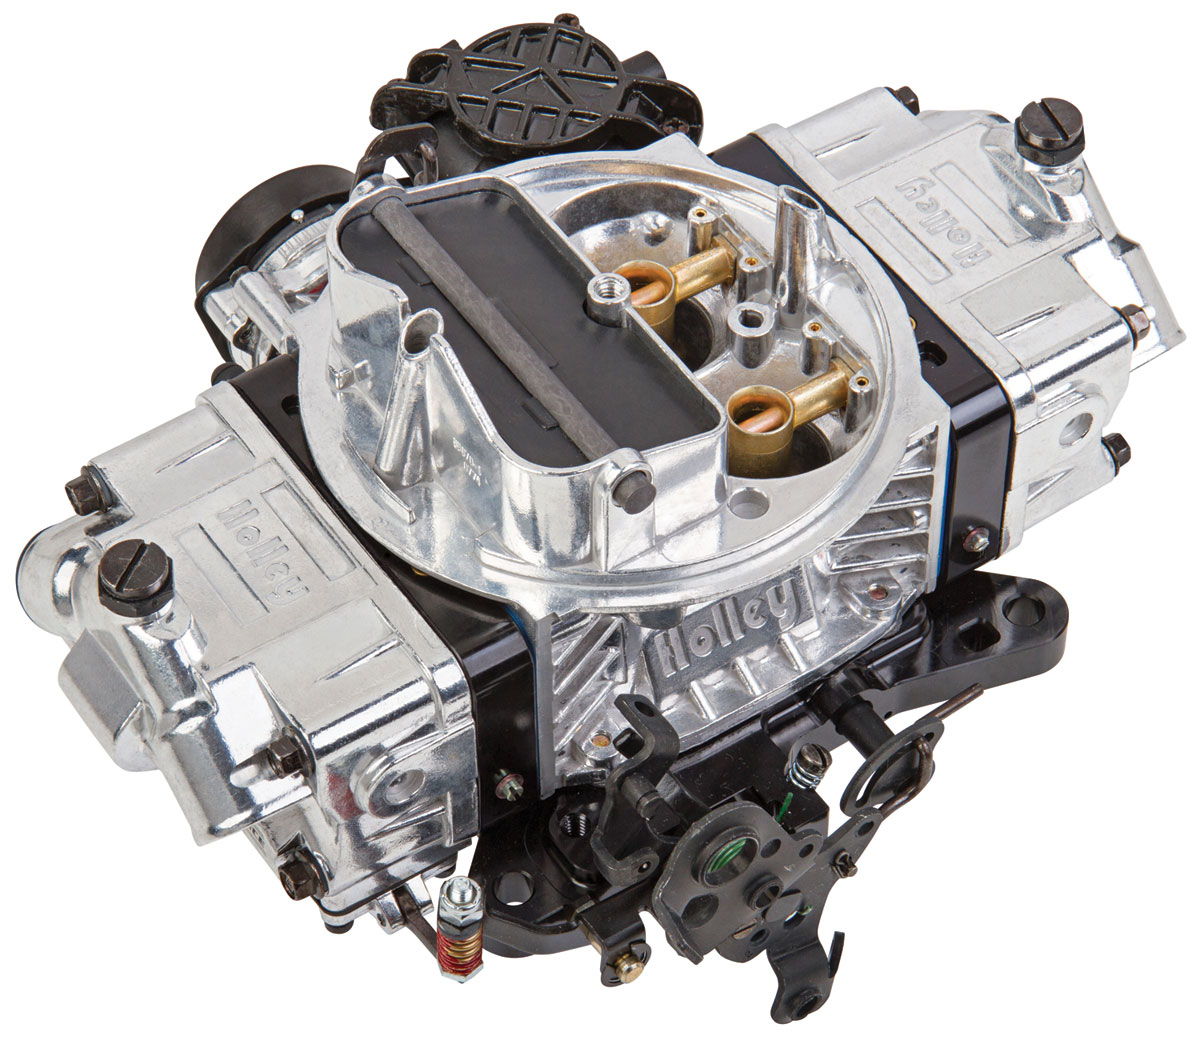 Carburetor, Holley, 670 CFM Ultra Street Avenger, Black Metering Blocks